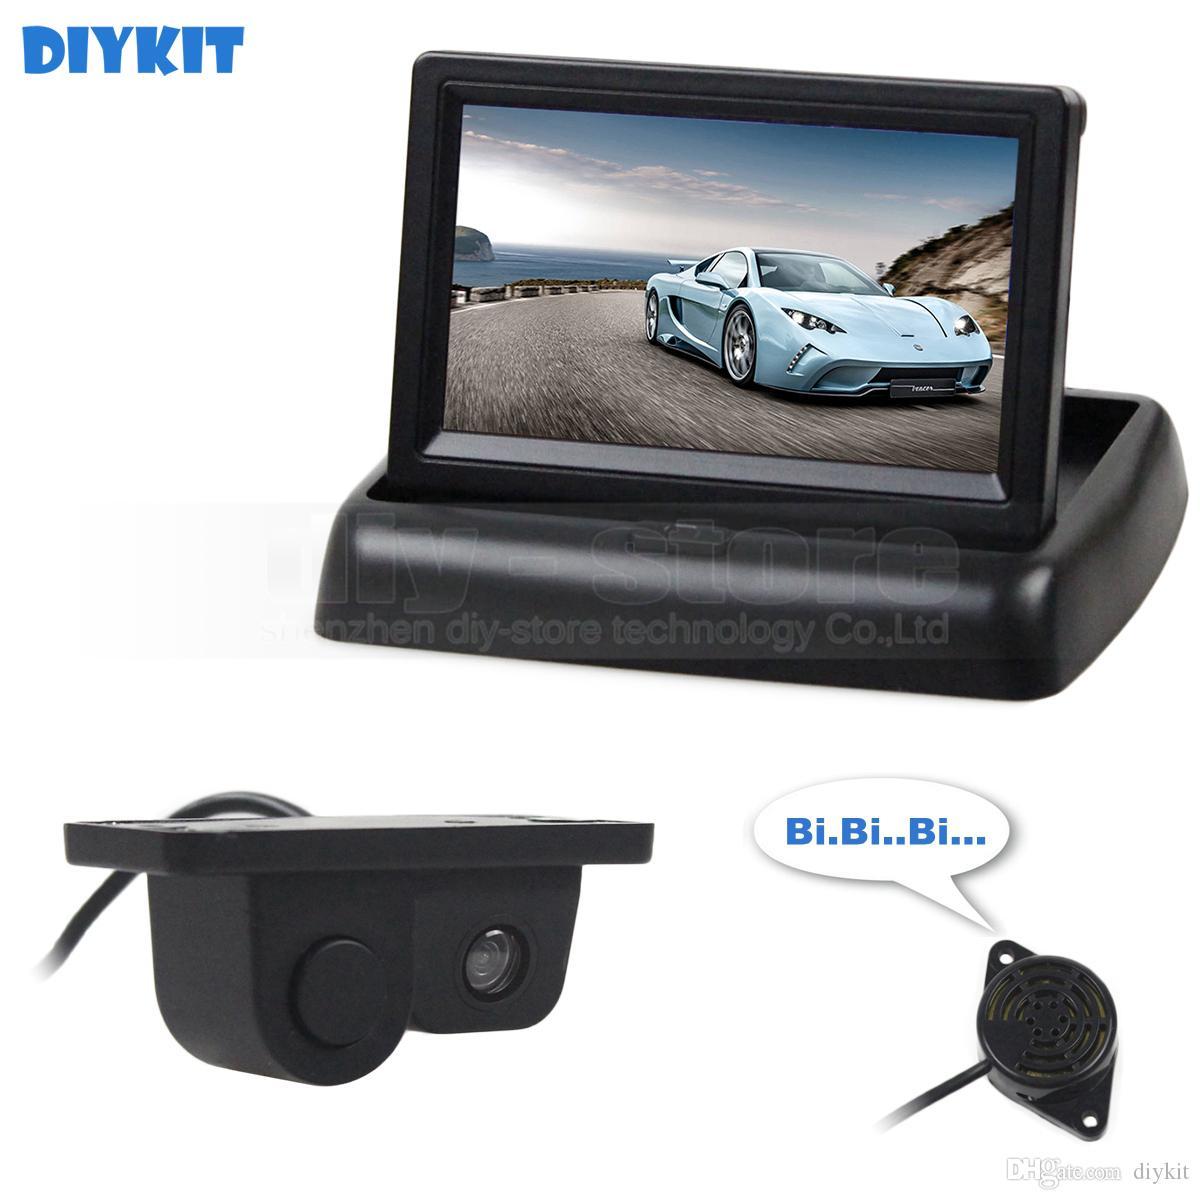 DIYKIT 4.3inch Rear View Monitor Car Monitor + Video Parking Radar Sensor Car Camera Parking System Kit 2 In 1